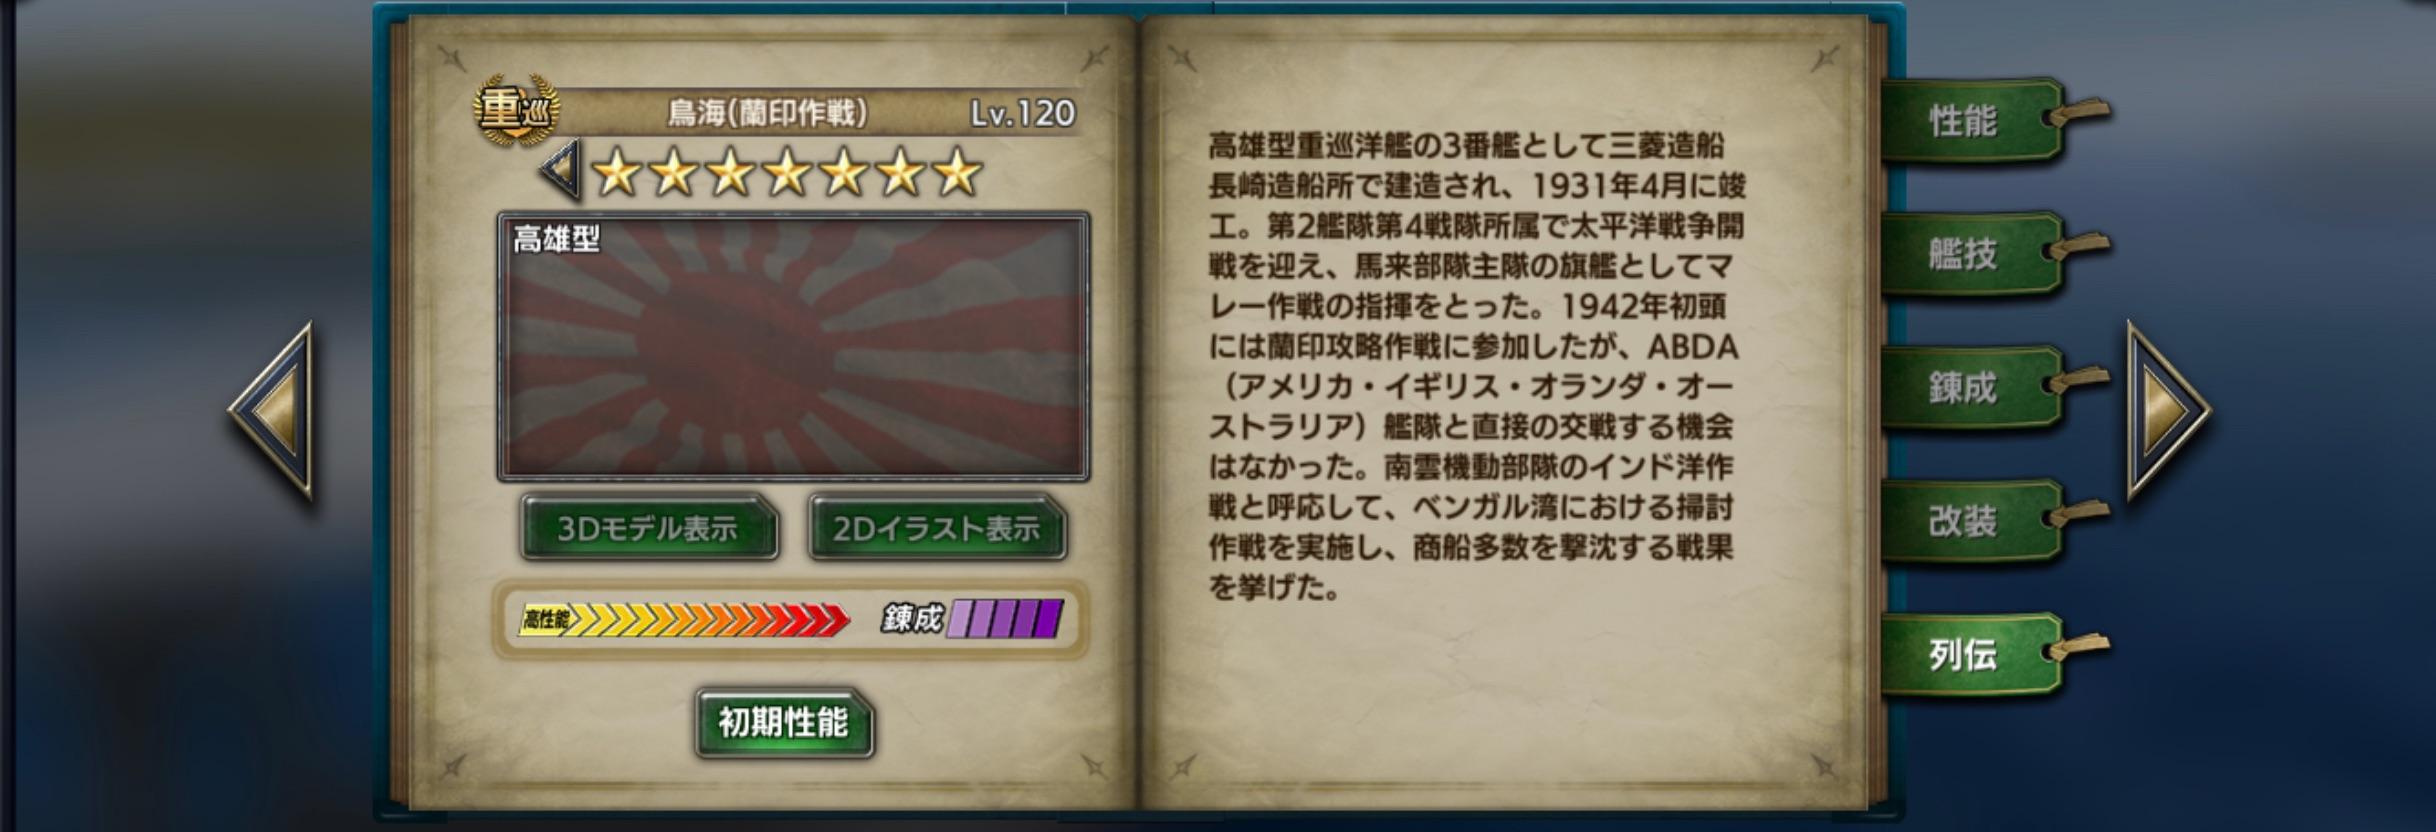 ChokaiD-history